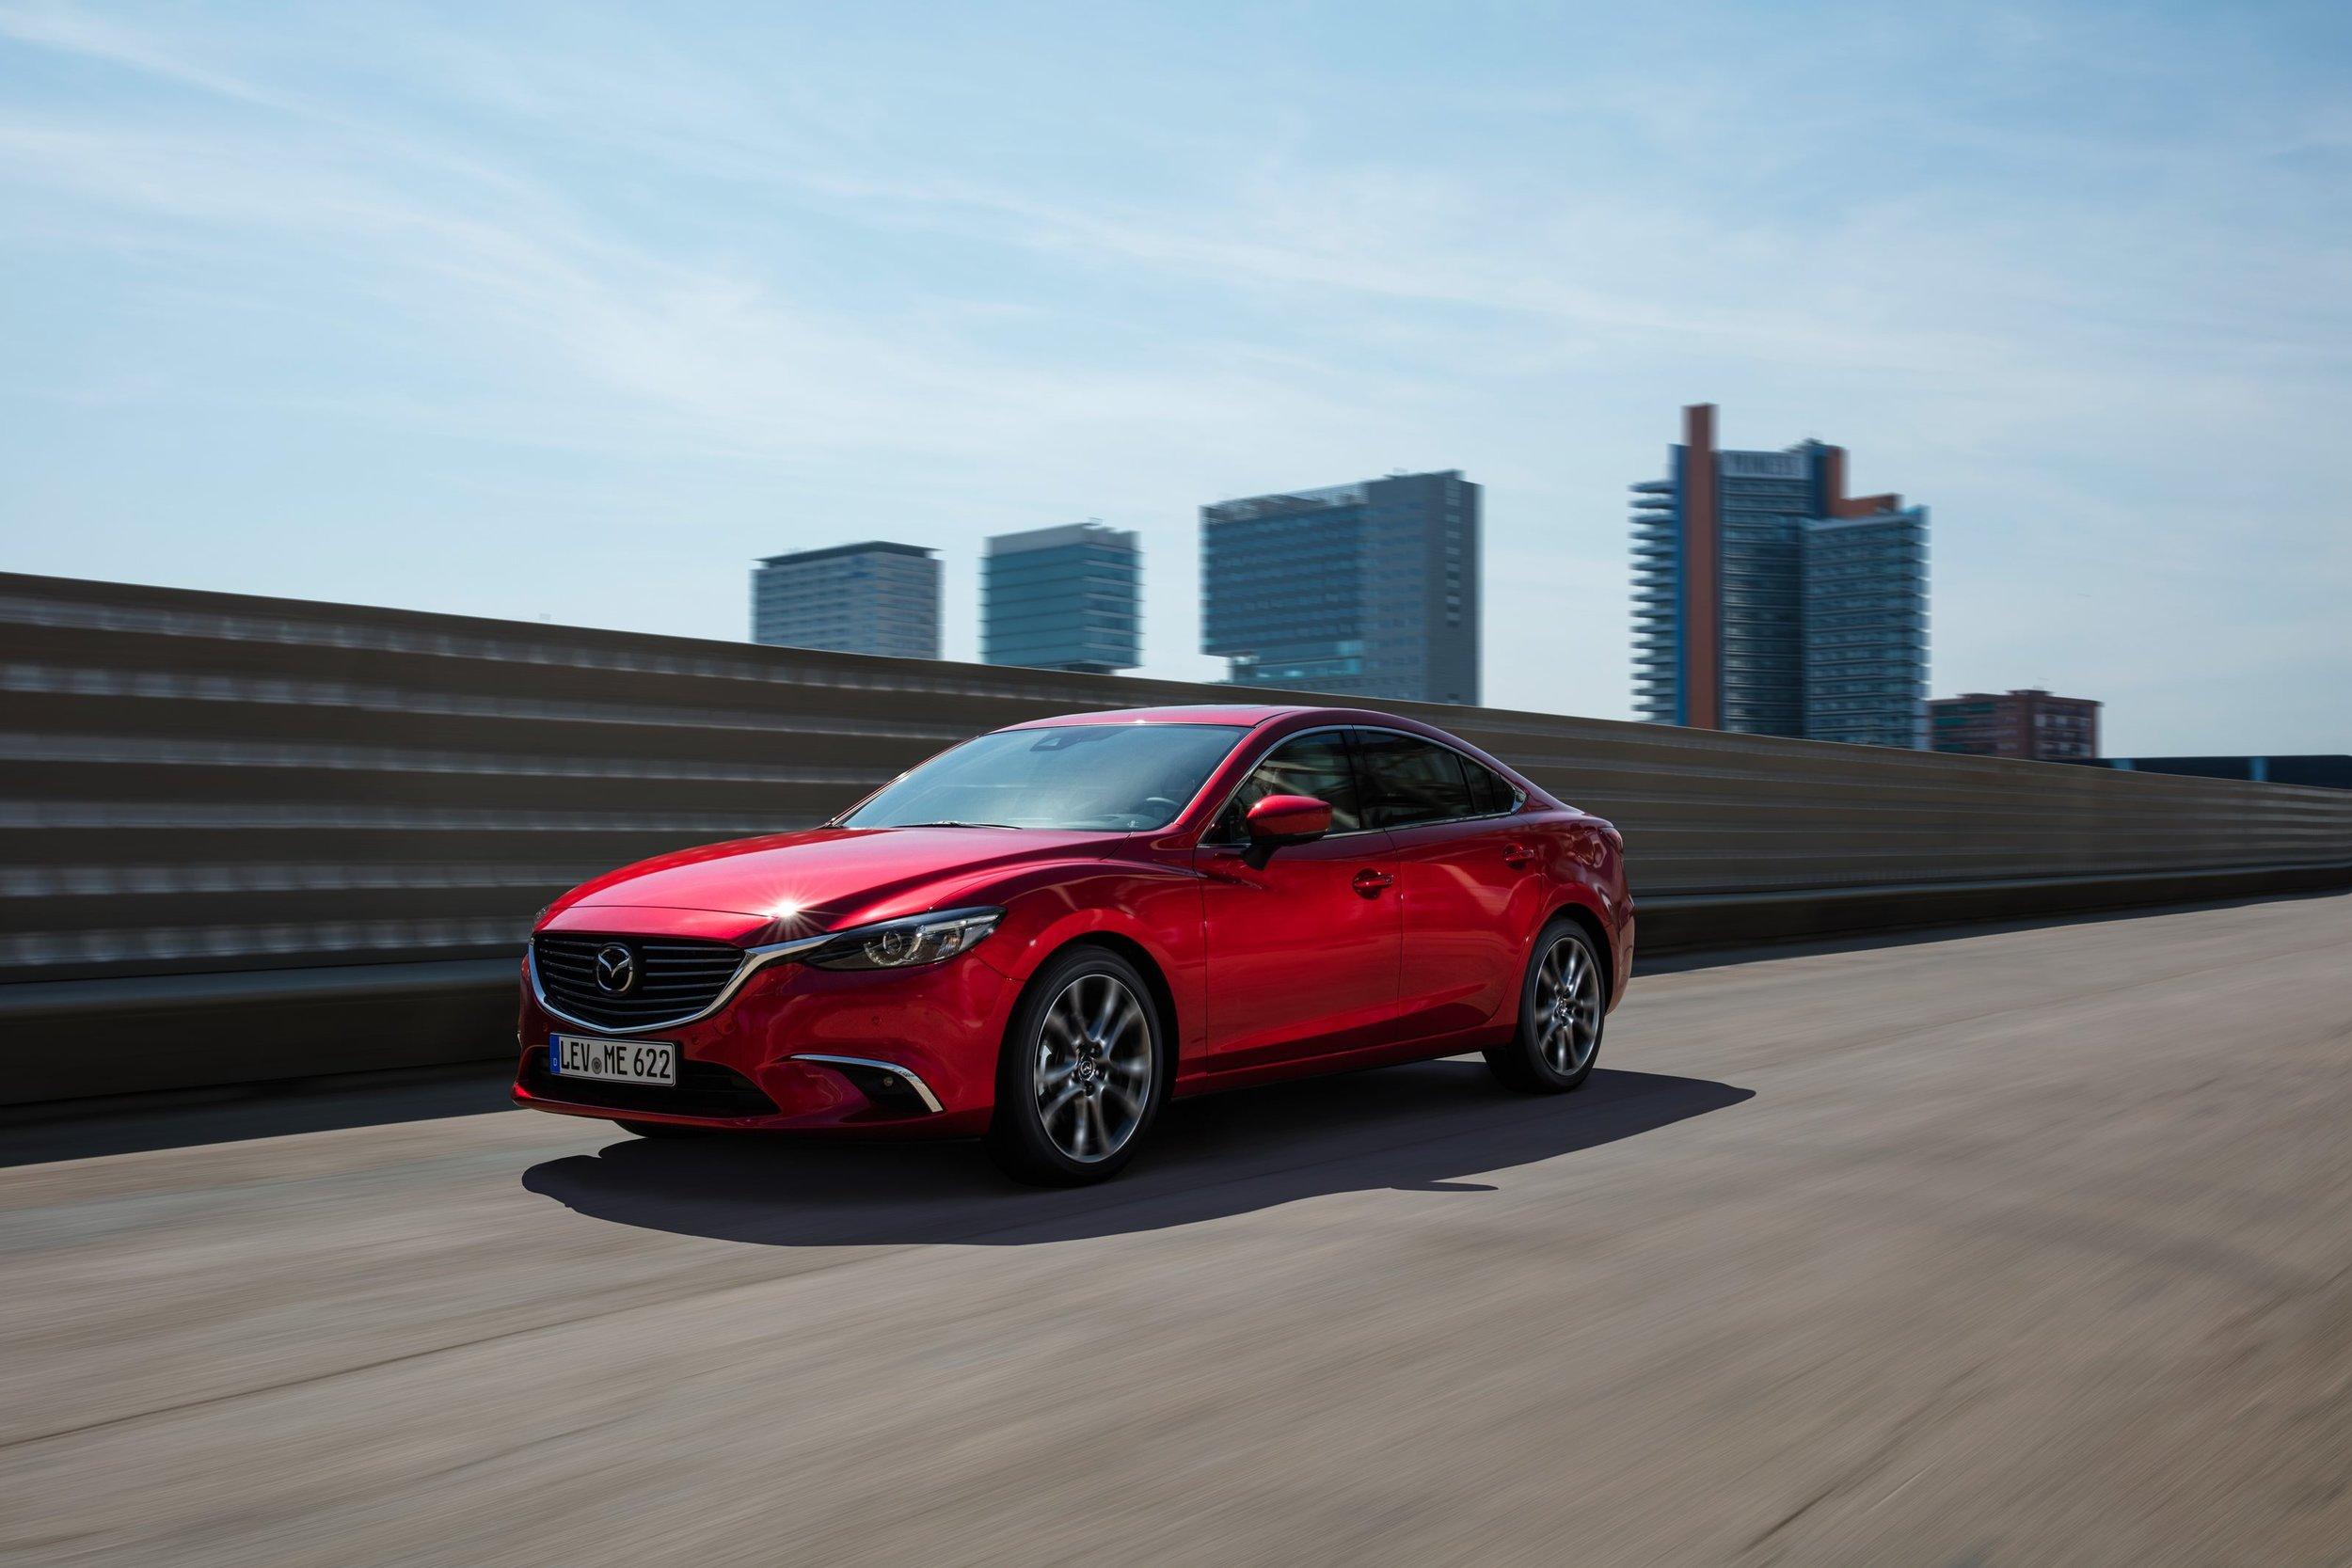 2017-Mazda6_Sedan_Action_06.jpg